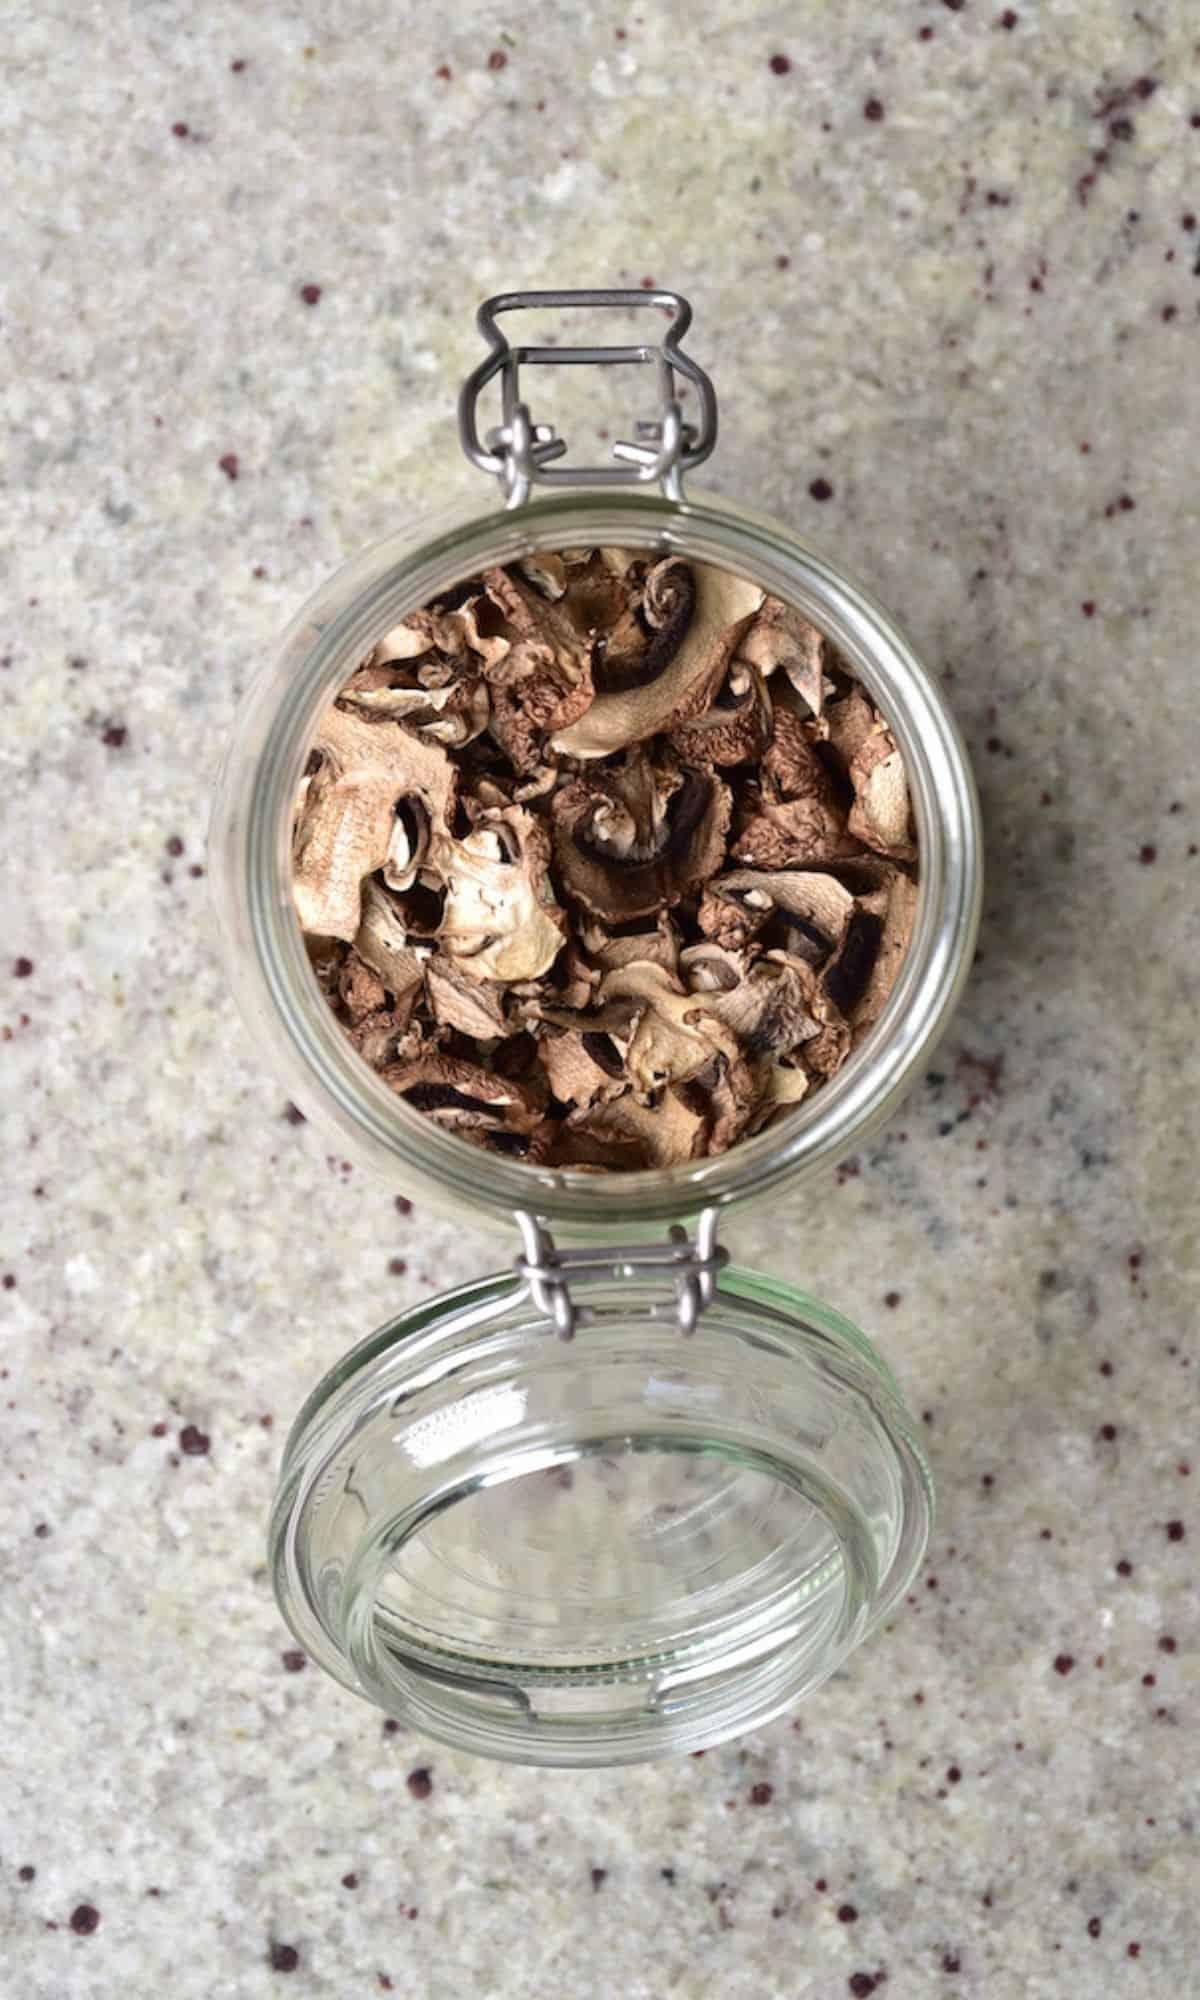 A jar with dried mushrooms